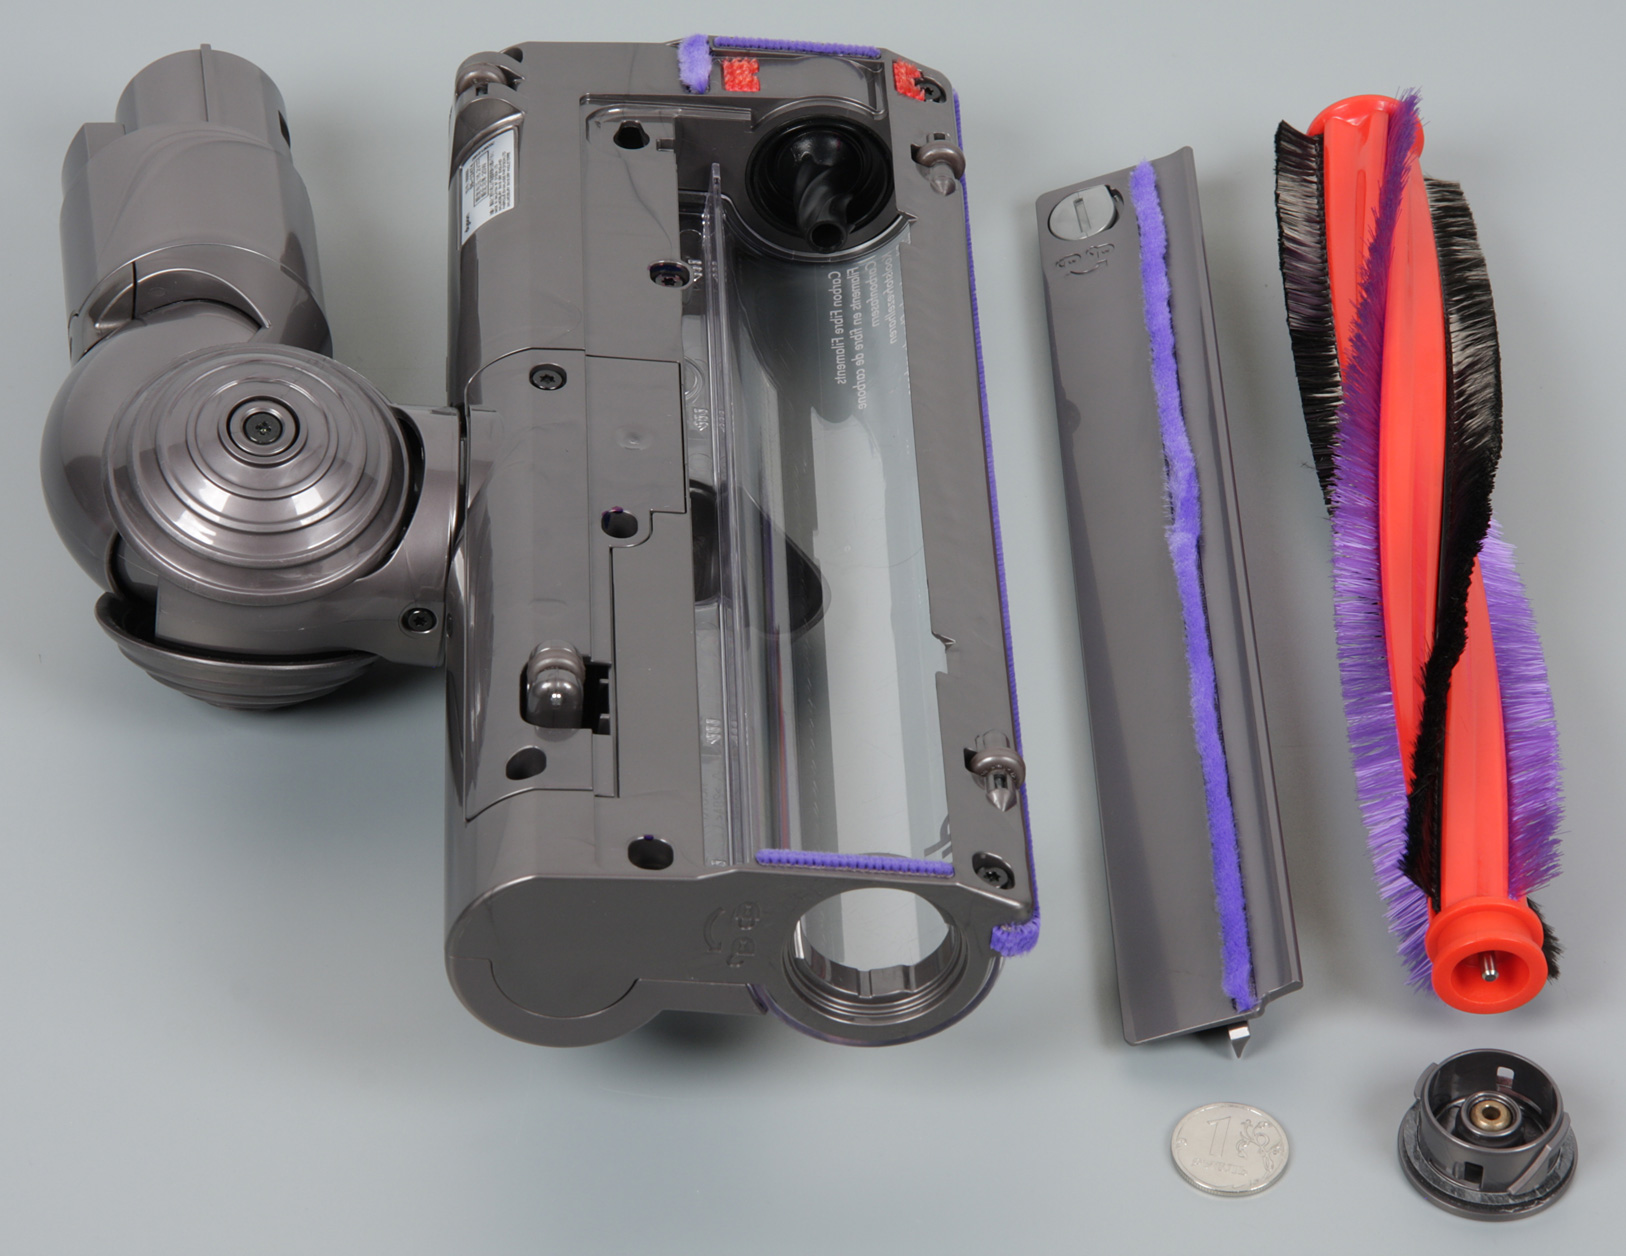 Щетка dyson ремонт фильтр для дайсон dc 32